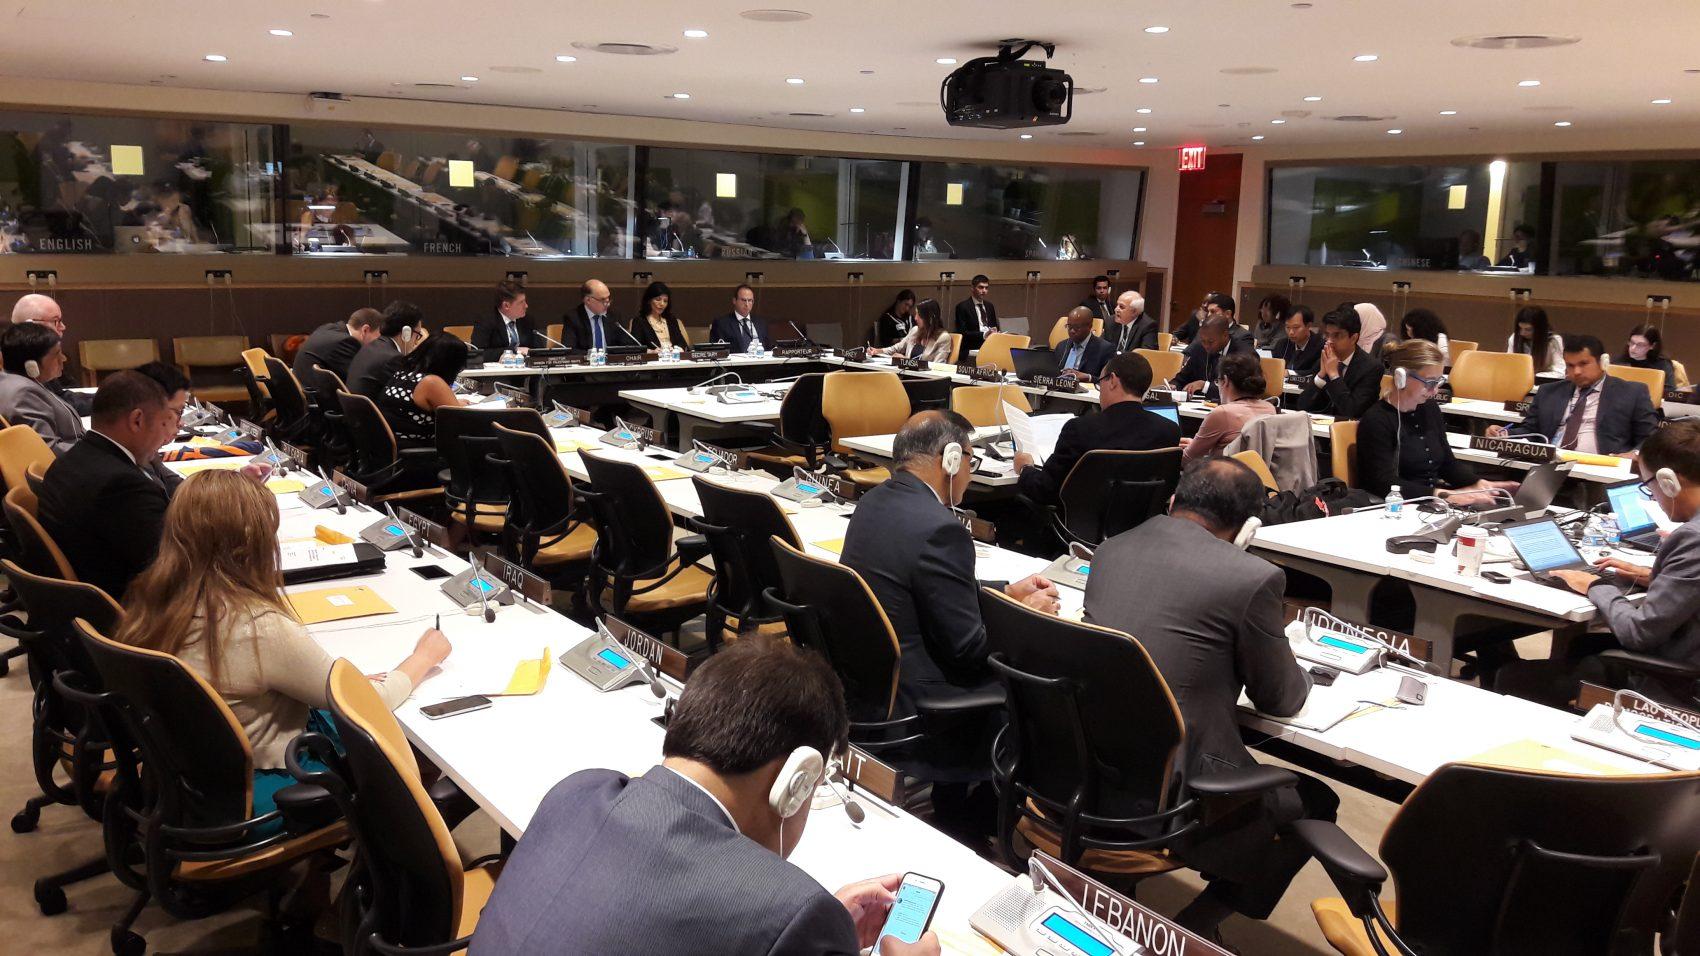 384th Committee Meeting - 6 September 2017